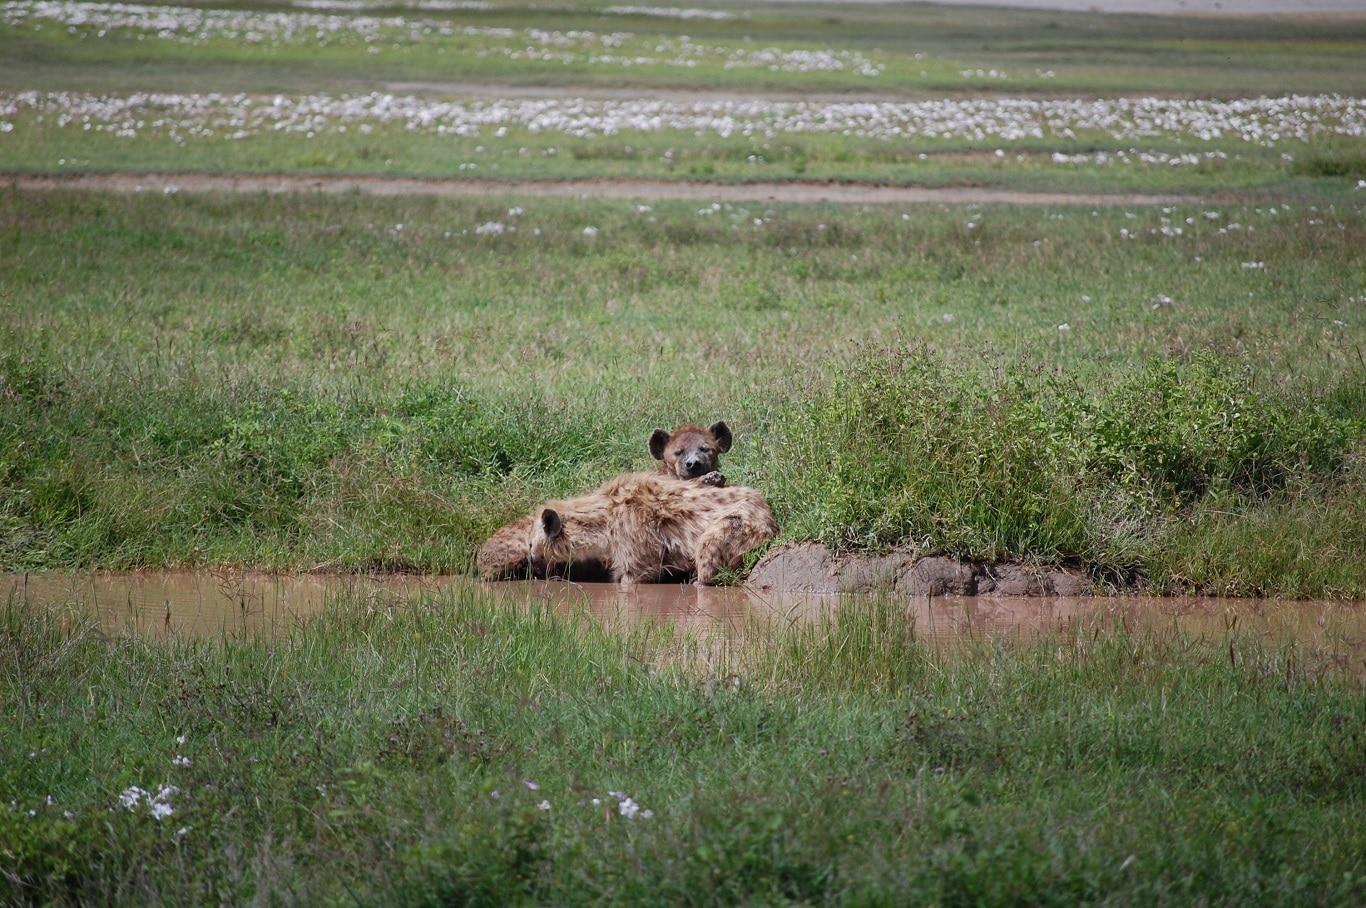 Huwelijksreizen Tanzania - Luierende hyena's in de Ngorongoro Krater